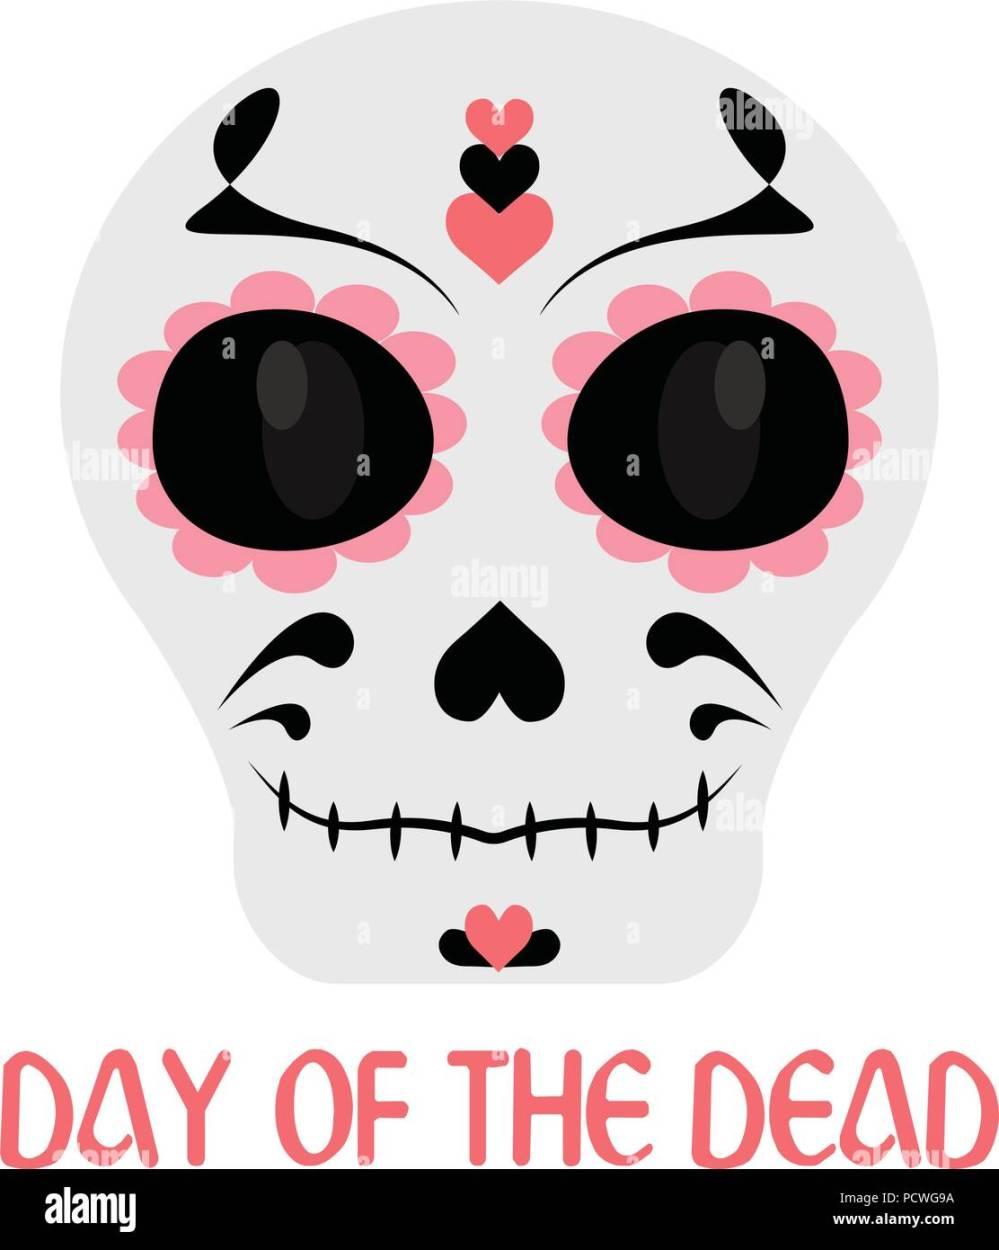 medium resolution of day of the dead stock vector